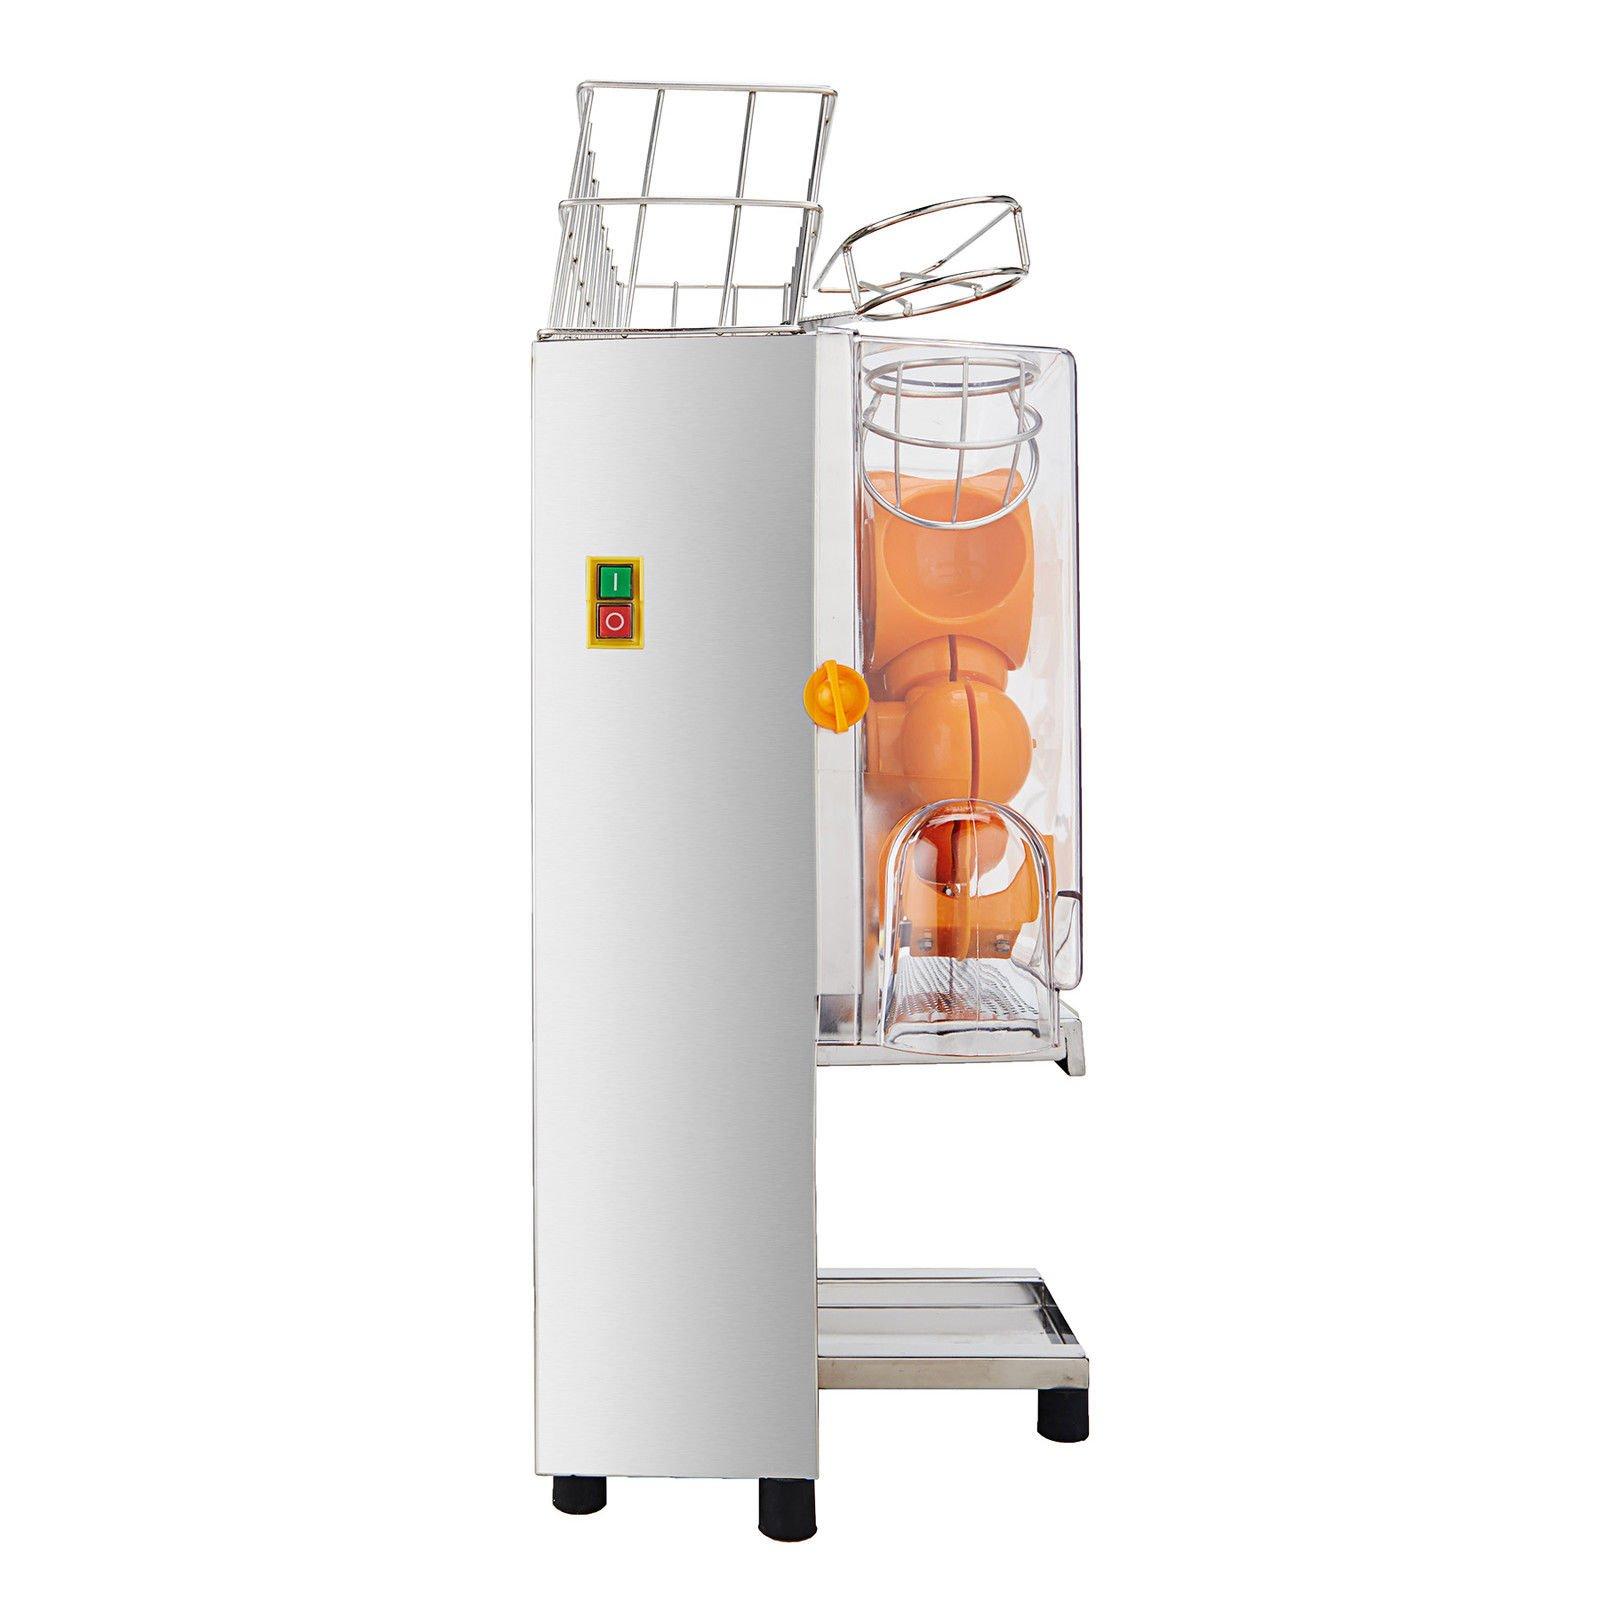 Happybuy Orange Juicer Orange Squeezer Machine Citrus Juicer Electric Fruit Juicer Machine Citrus Lemon Lime Automatic Auto Feed Commercial (Stainless Steel tank) by Happybuy (Image #3)